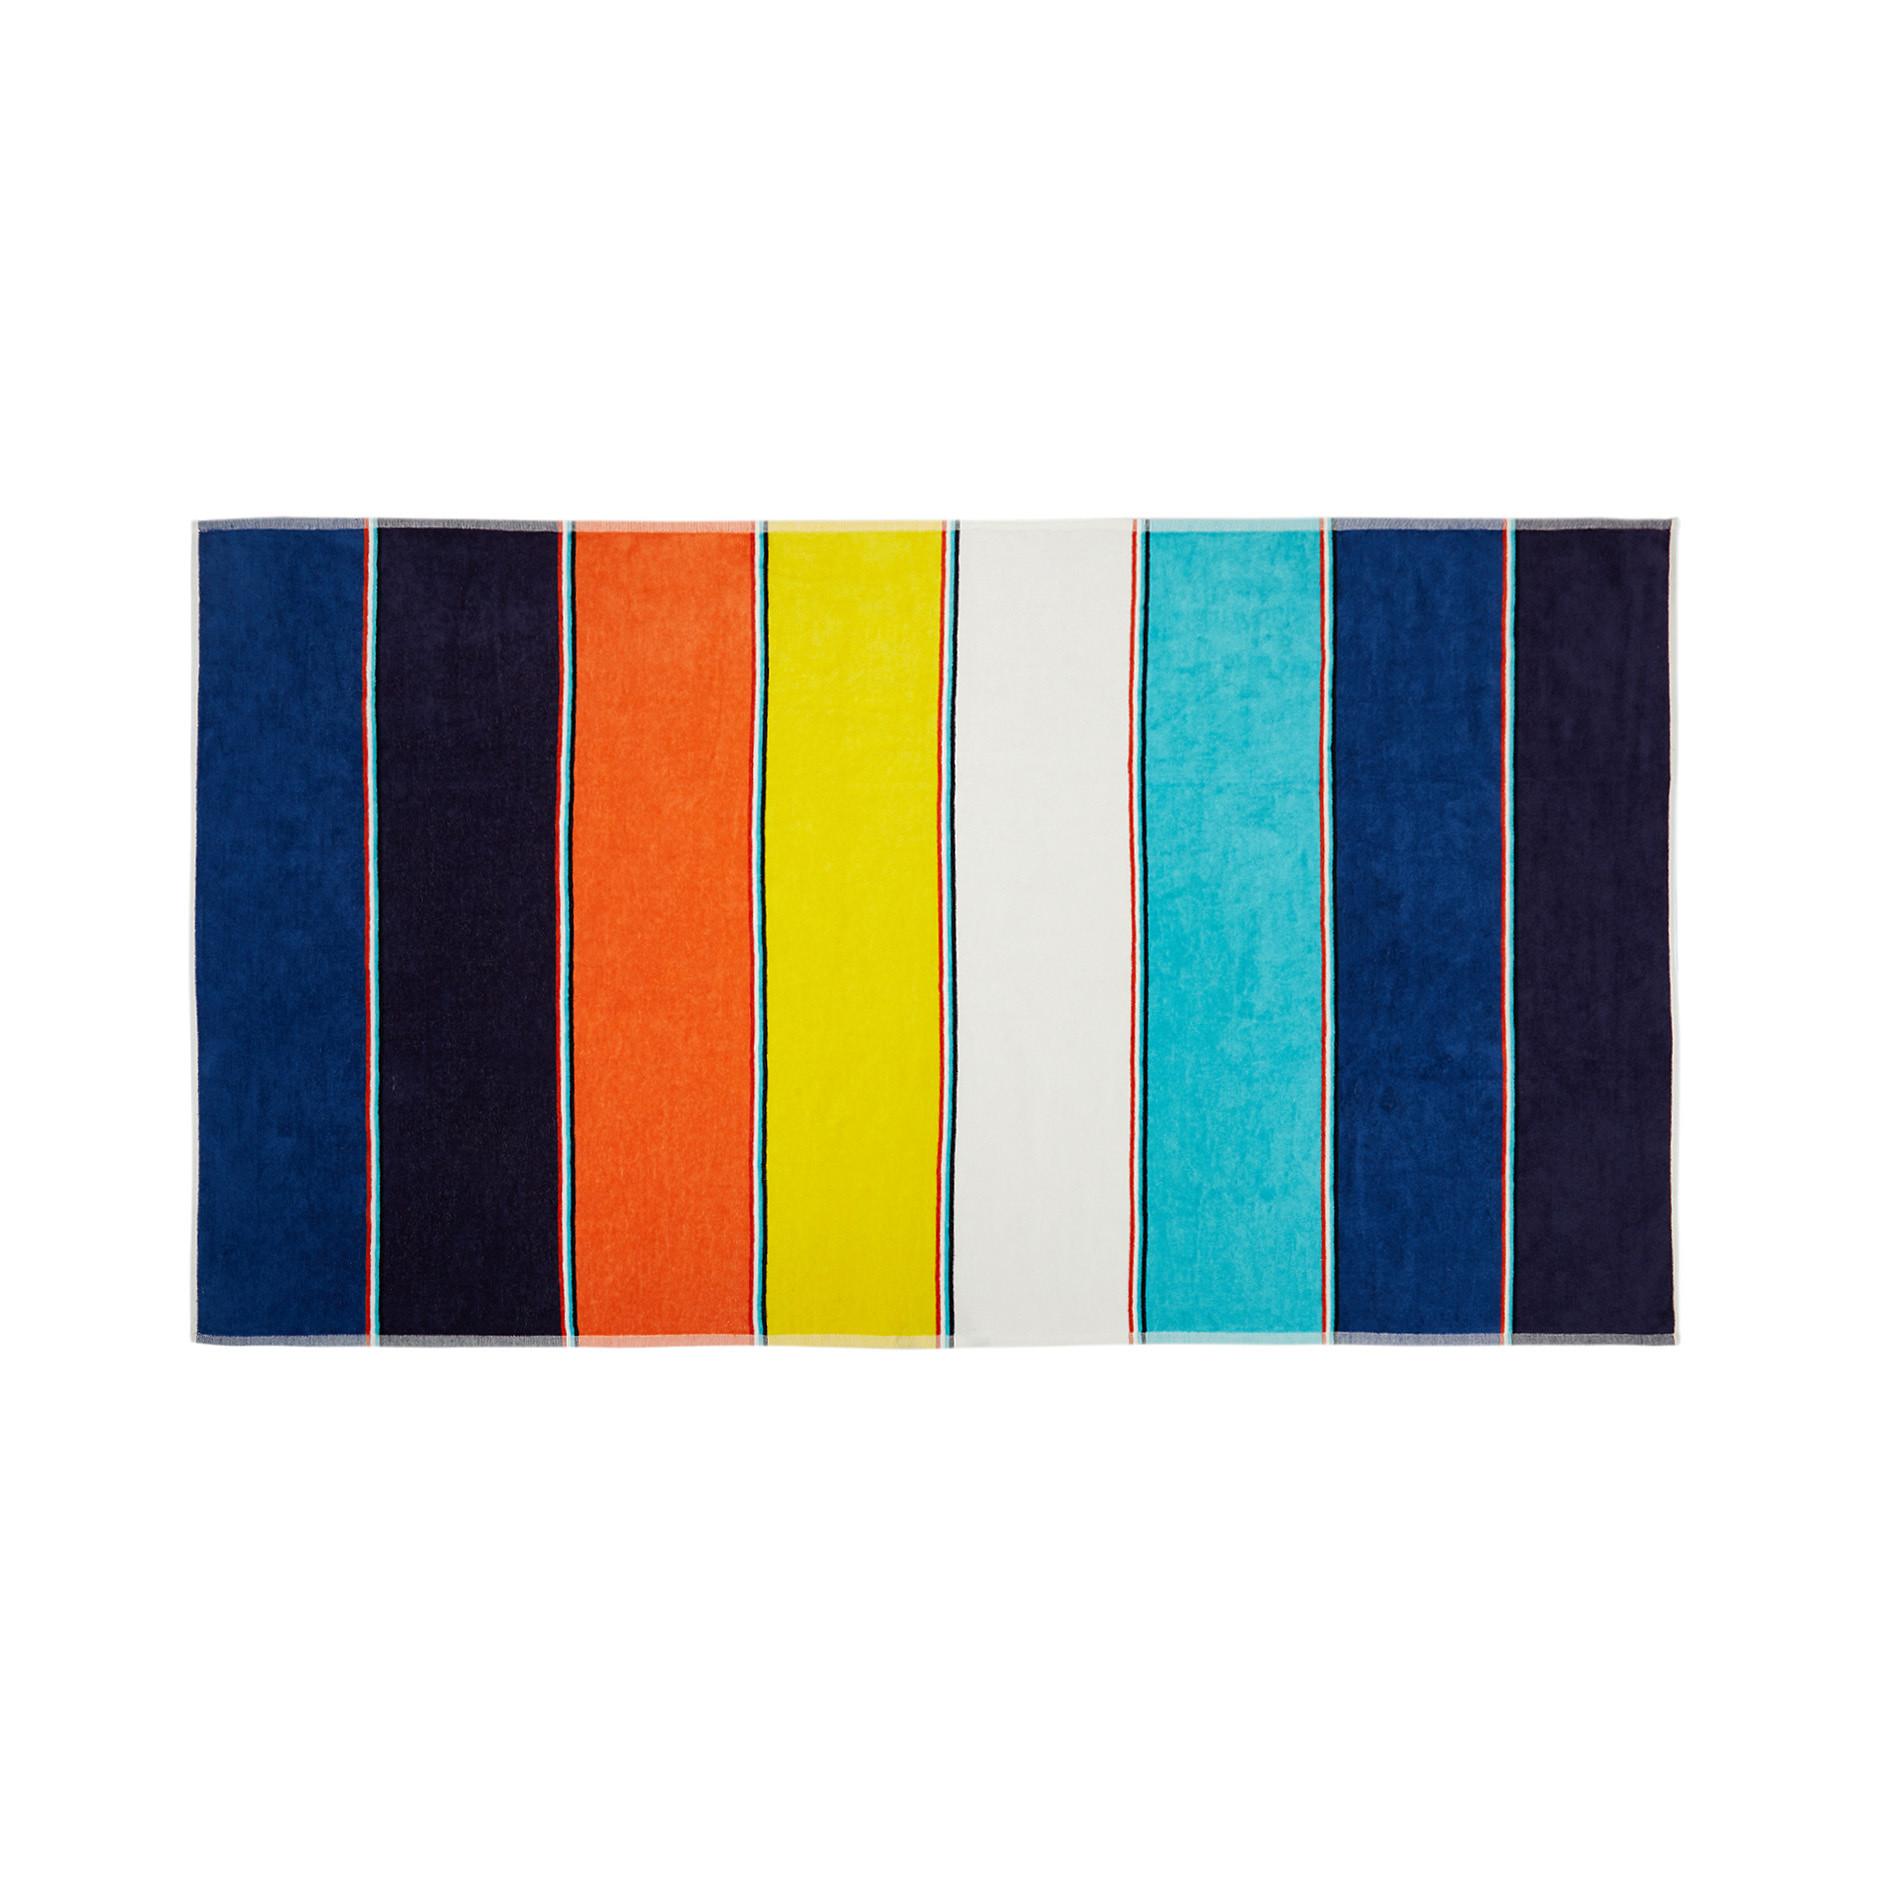 Telo mare cotone velour stampa a righe multicolore, Multicolor, large image number 0